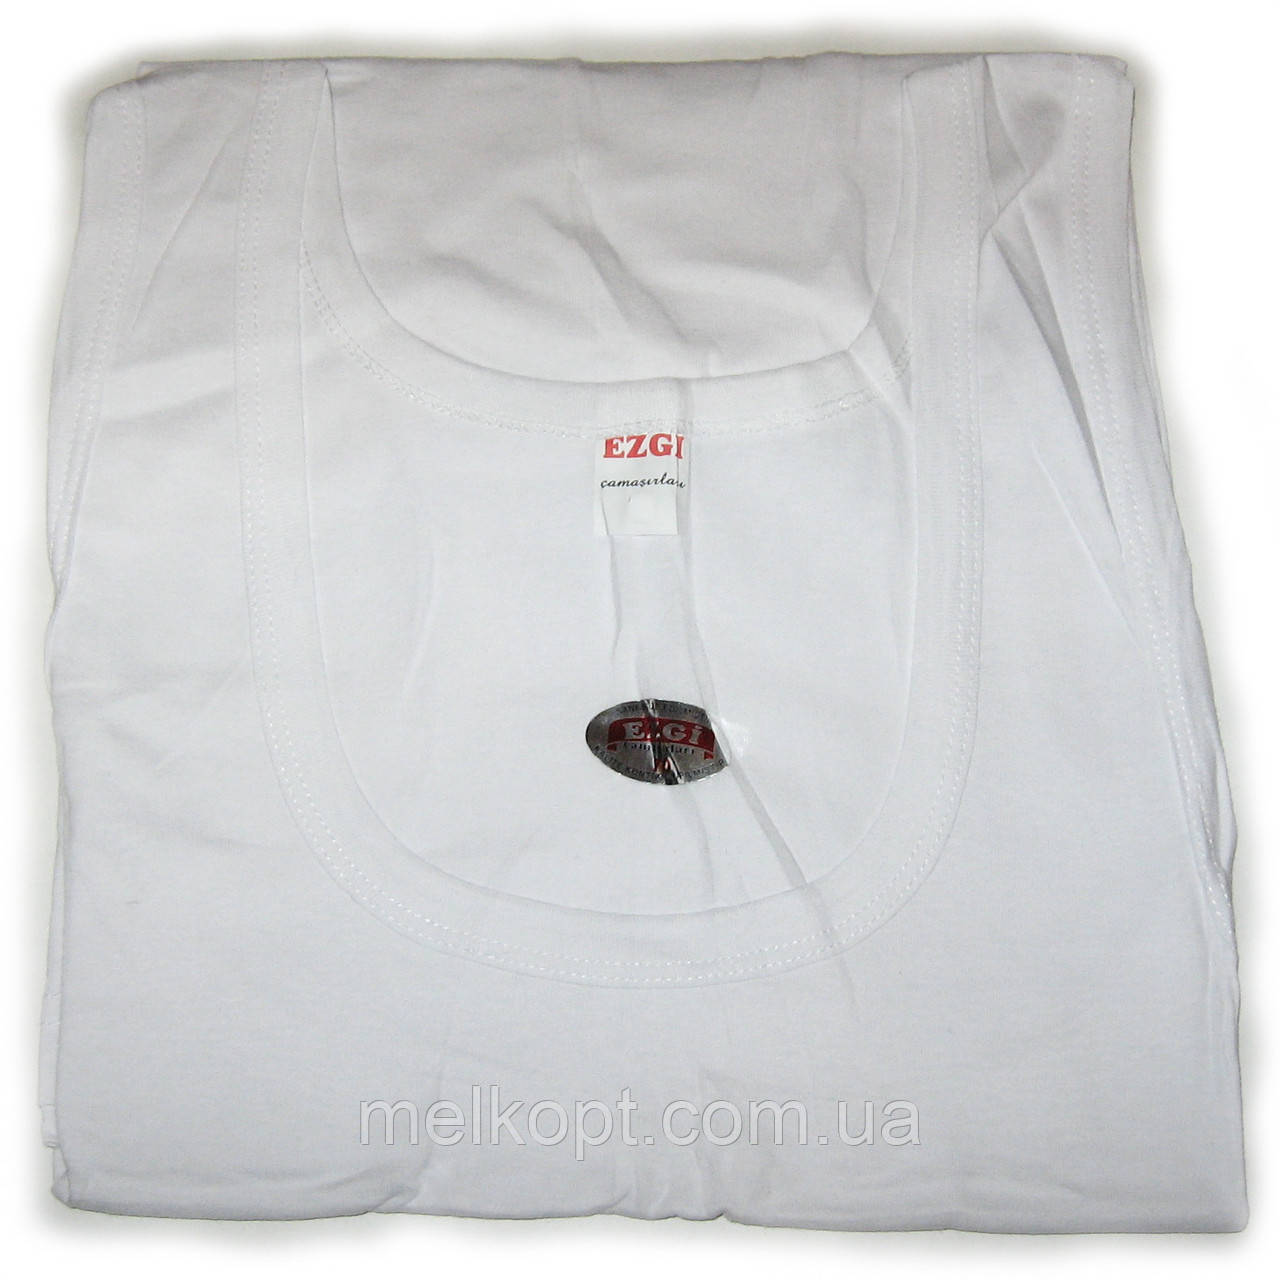 Мужские майки Ezgi - 34,00 грн./шт. (51-й размер, белые)